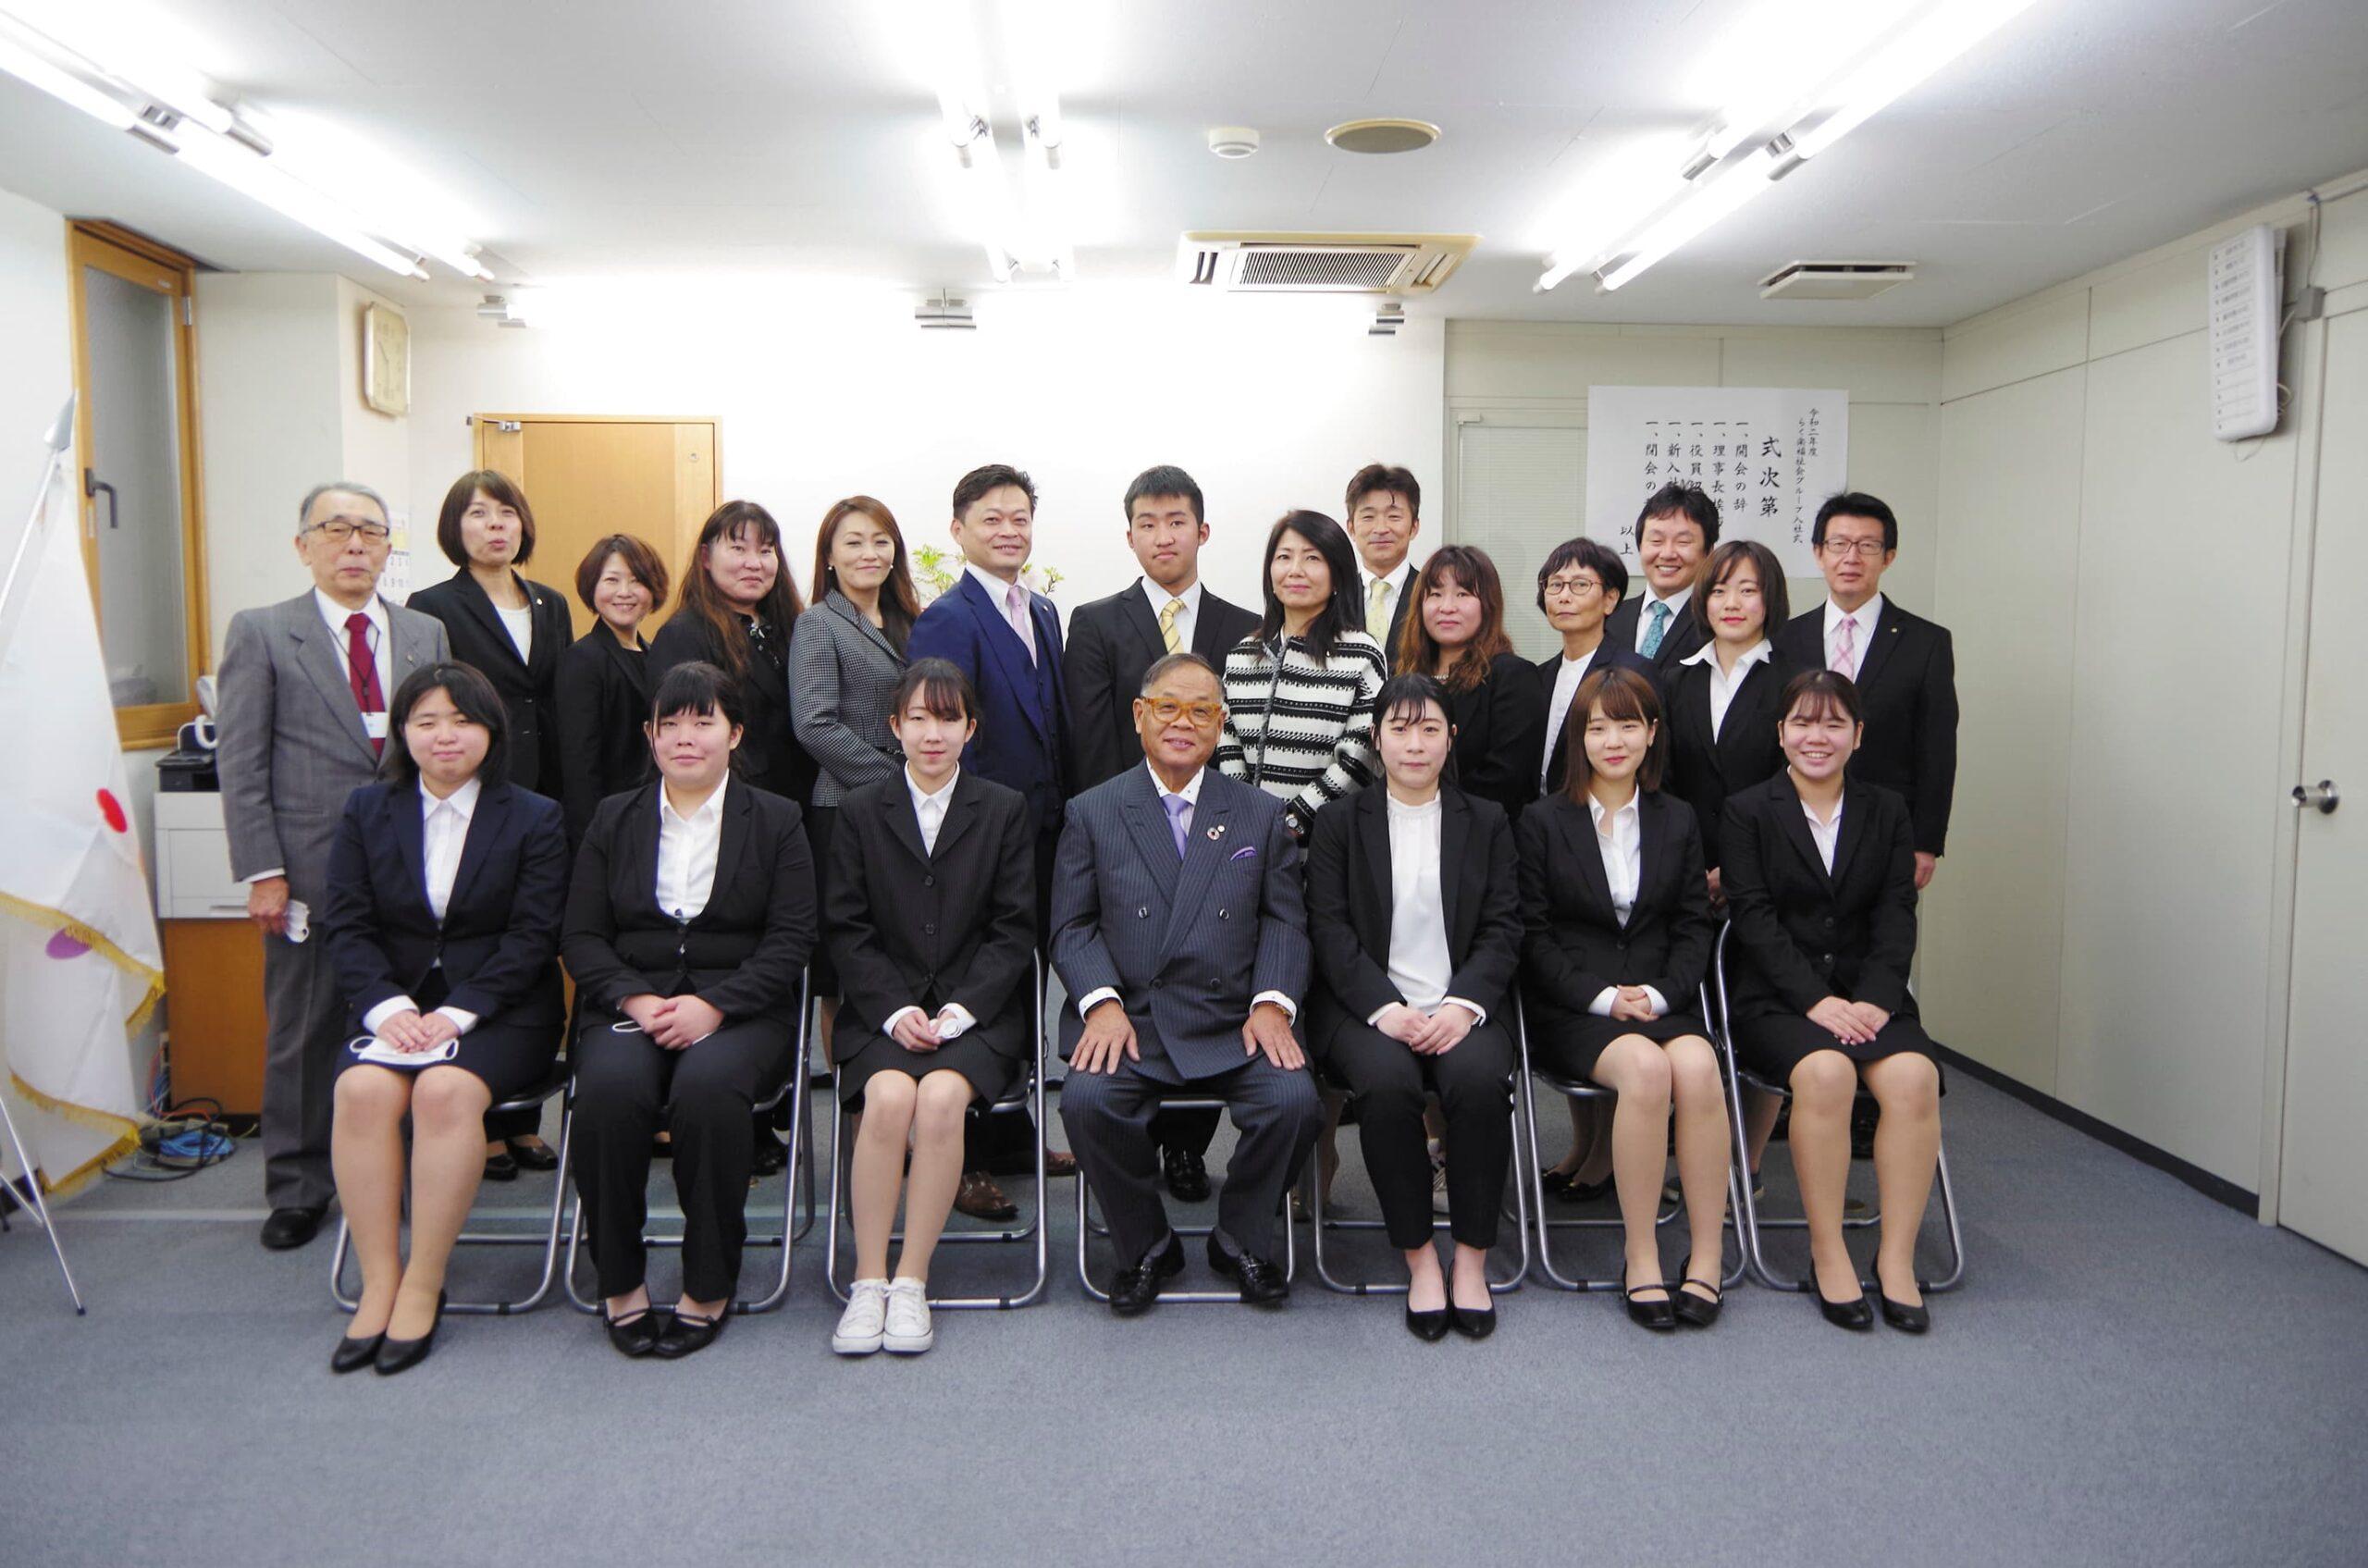 https://course-kagawa.com/wp-content/uploads/2021/03/2021らく楽00027-scaled.jpg